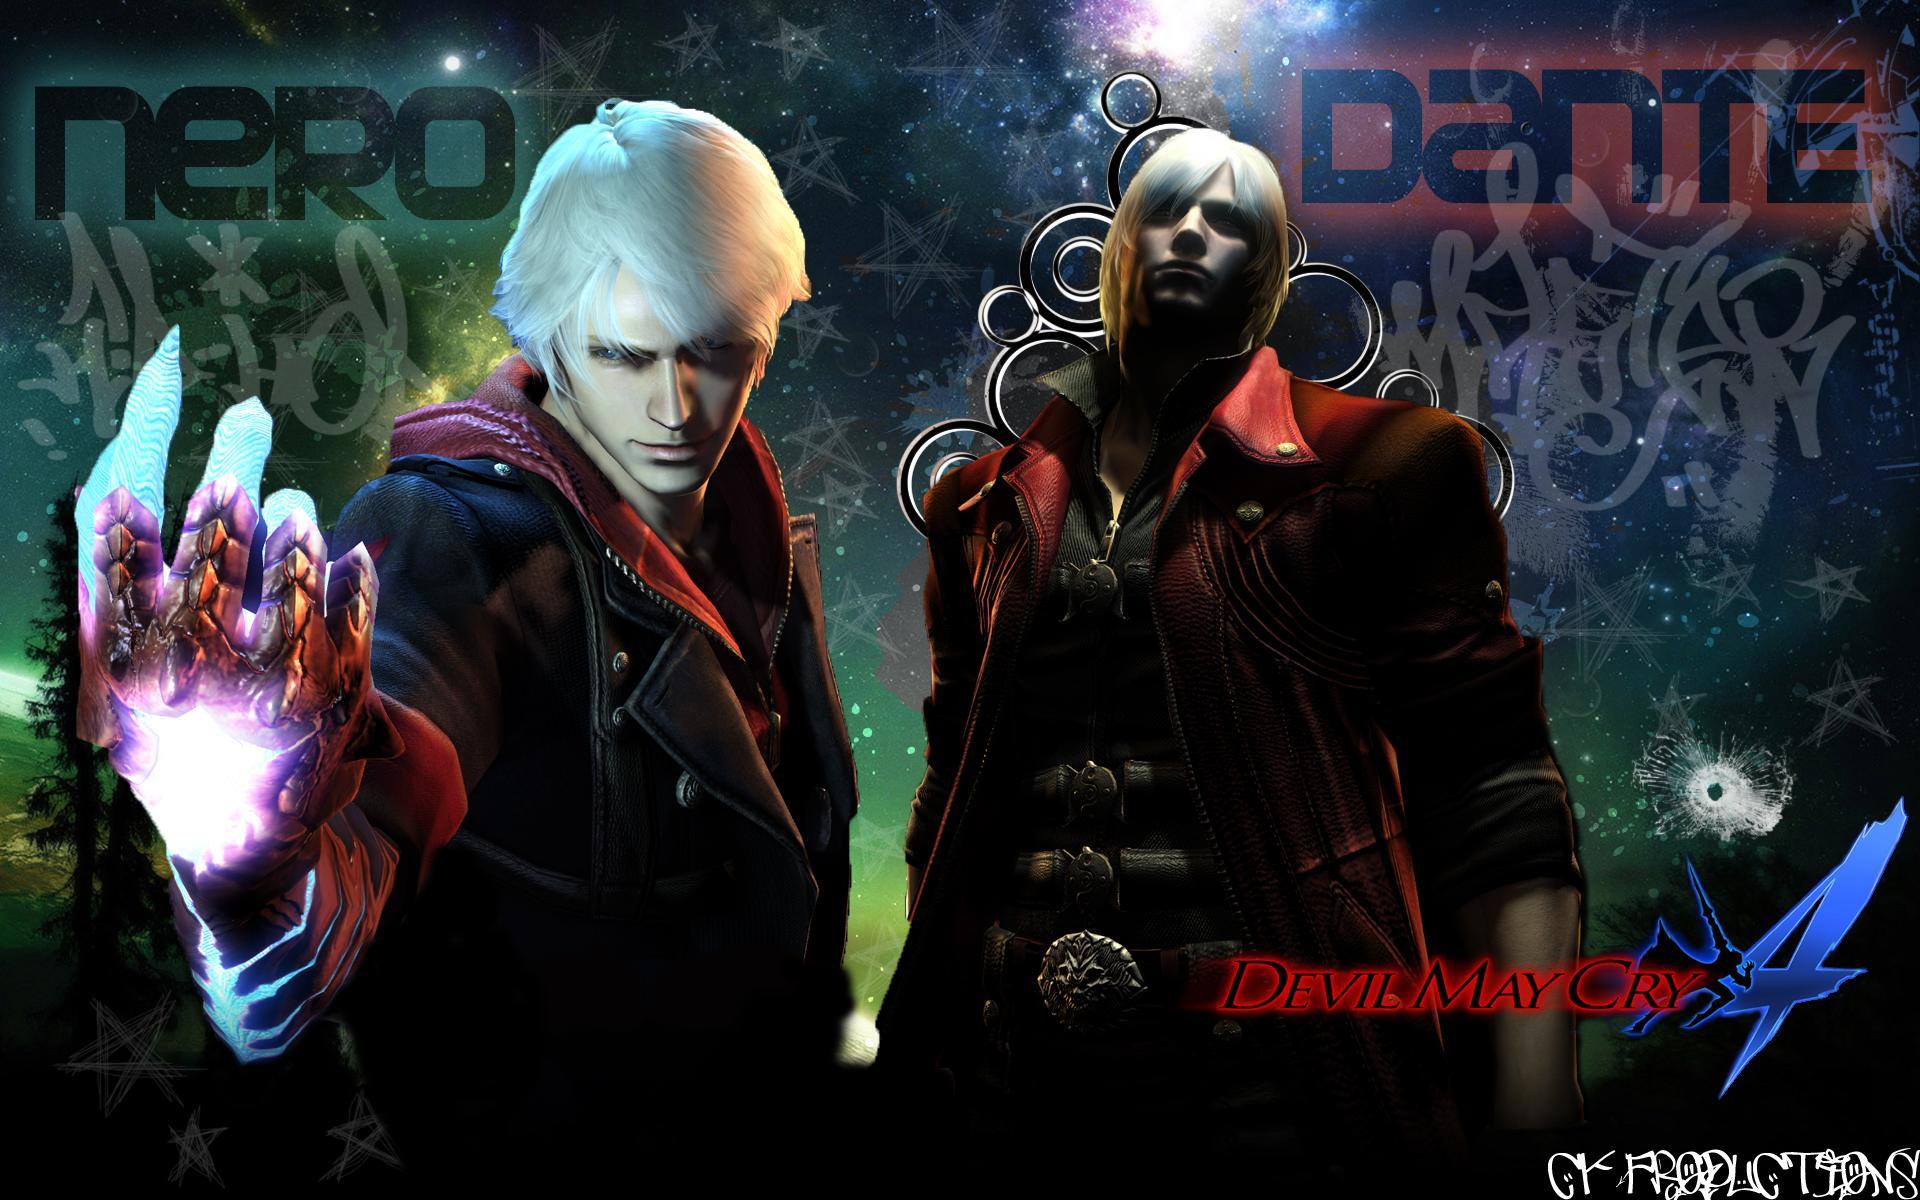 Devil May Cry 4 wallpaper 7